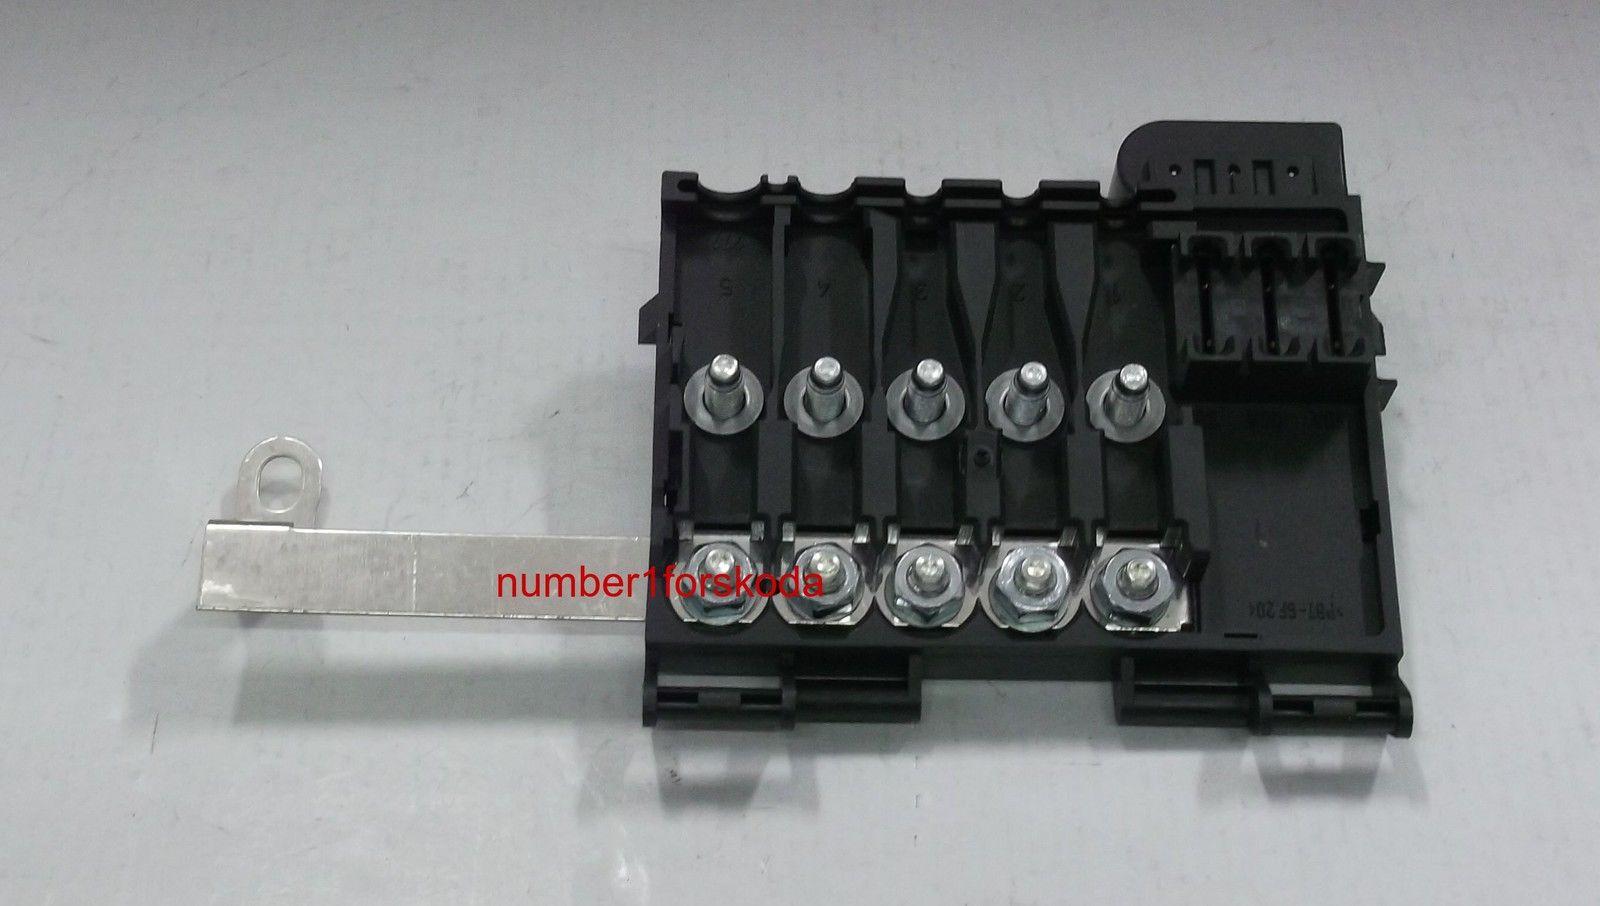 hight resolution of genuine skoda octavia mk1 1u battery fuse box 1j0937617c skoda fabia mk1 fuse box location octavia vrs mk1 fuse diagram